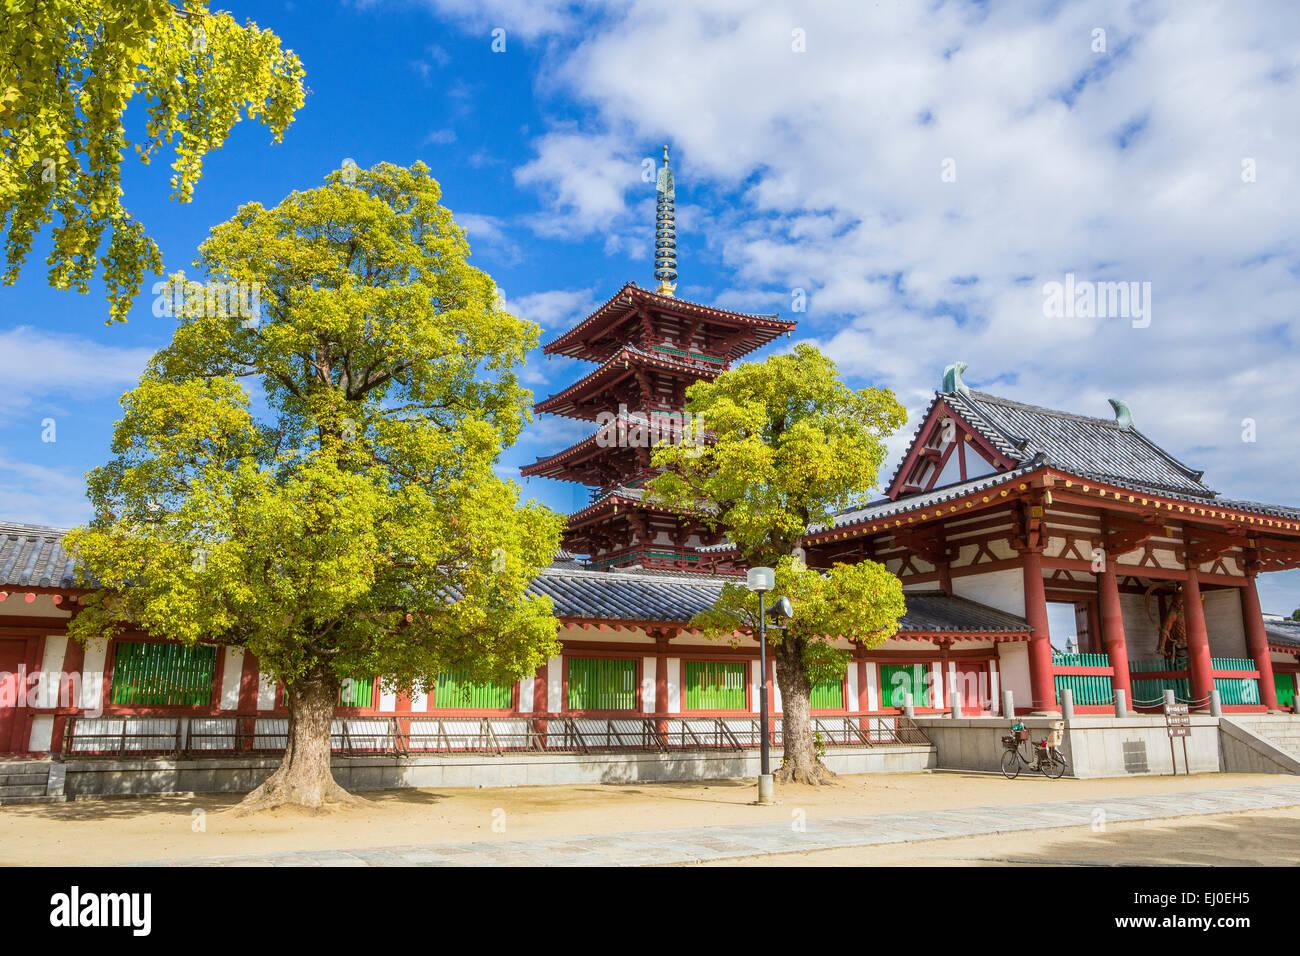 Le Japon, l'Asie, Kansai, Osaka, Ville, Temple, Shitennoji, patrimoine mondial, architecture, histoire, matin, Photo Stock